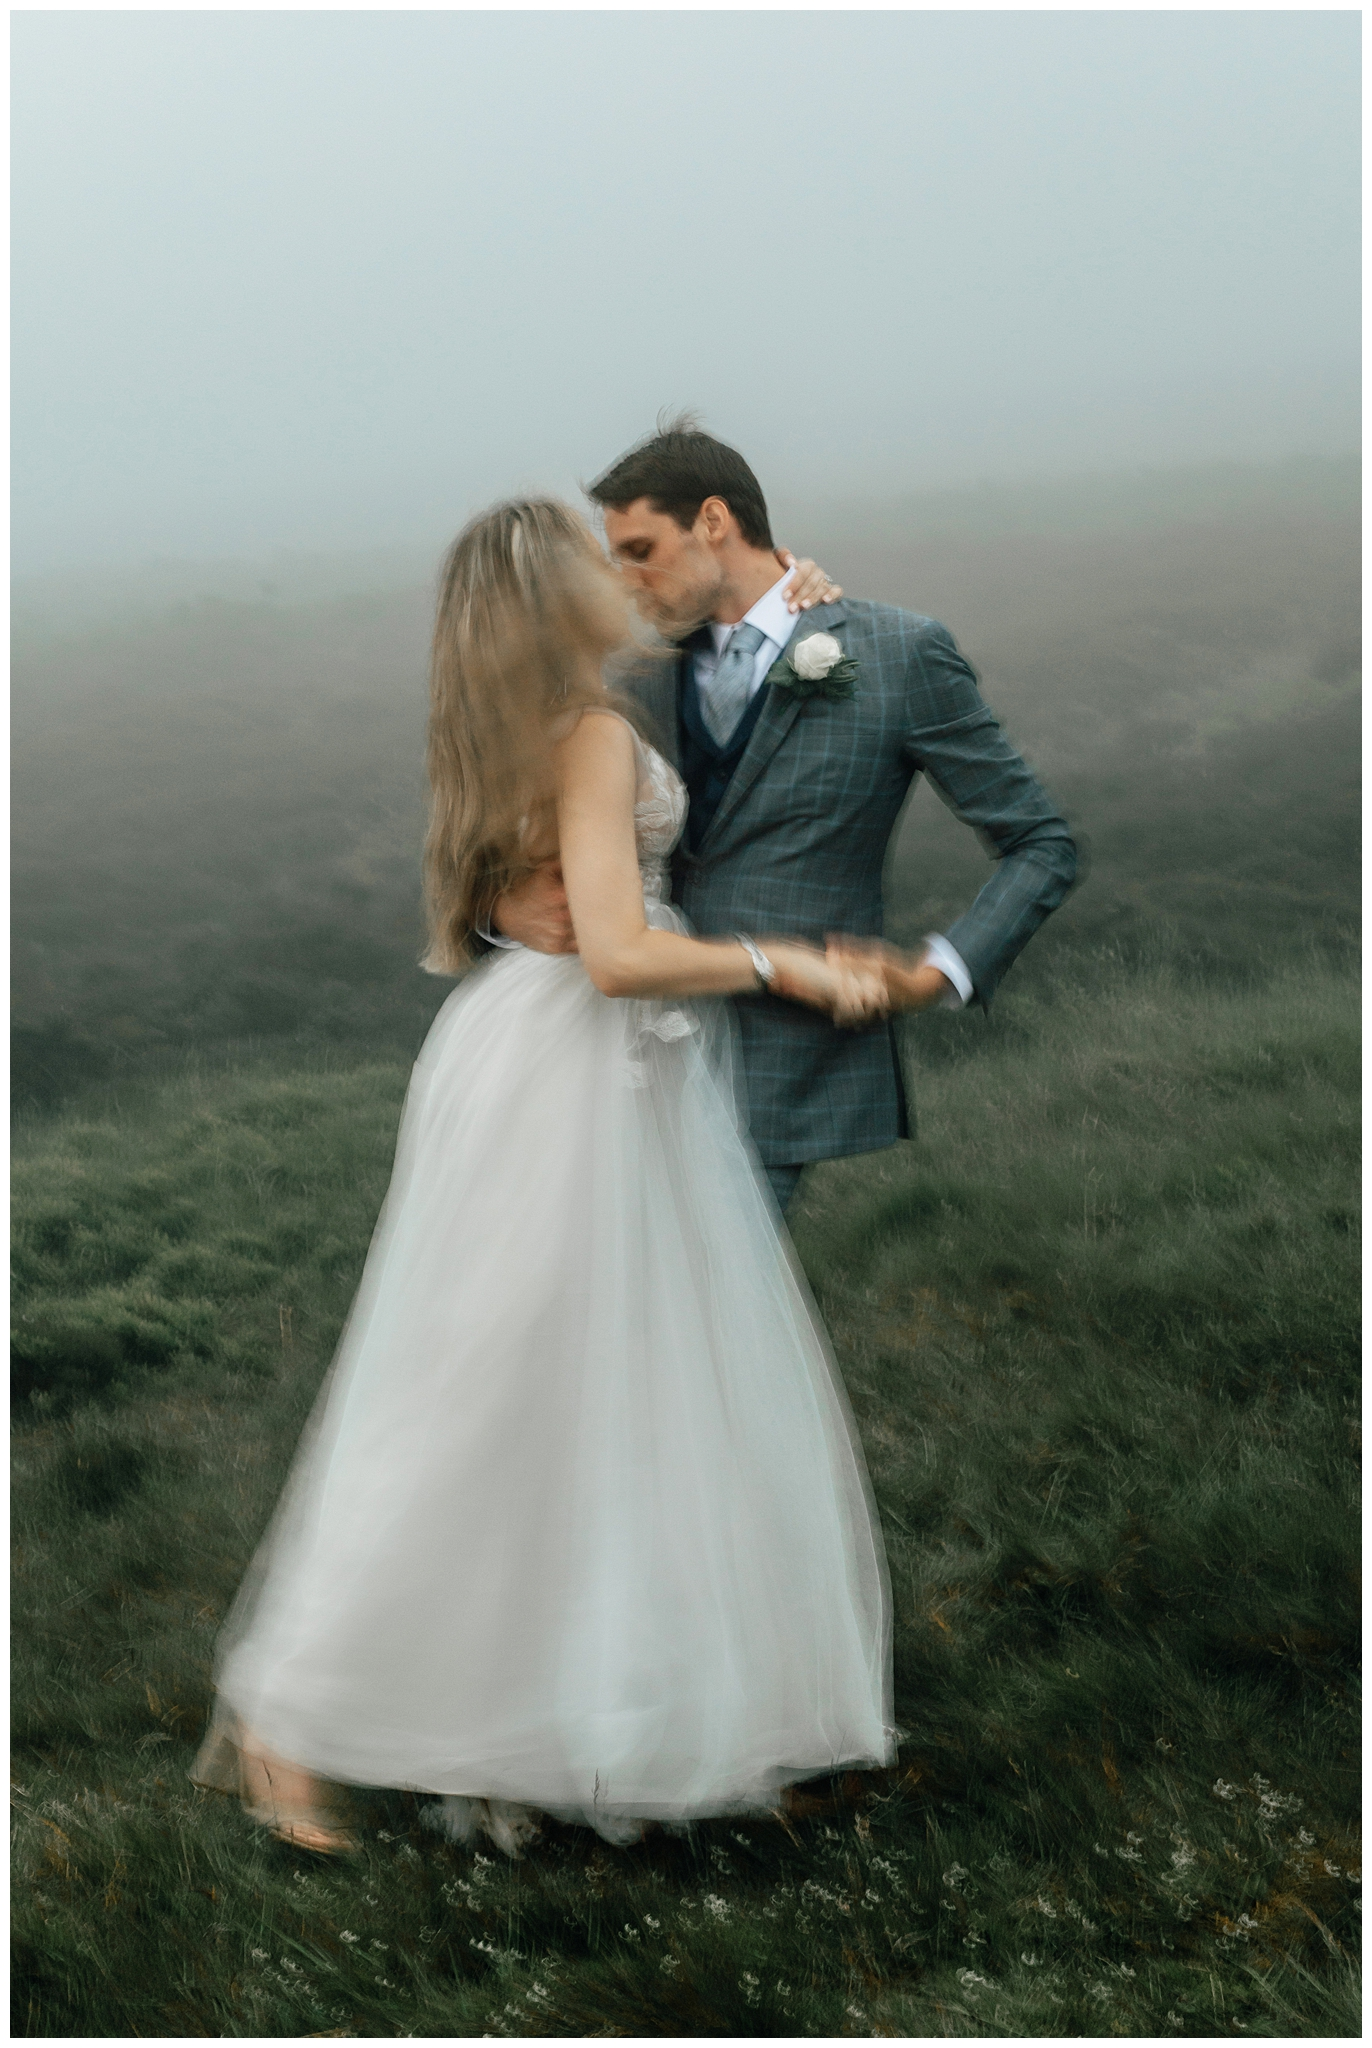 austin-texas-scottish-wedding-bride-groom22018.JPG